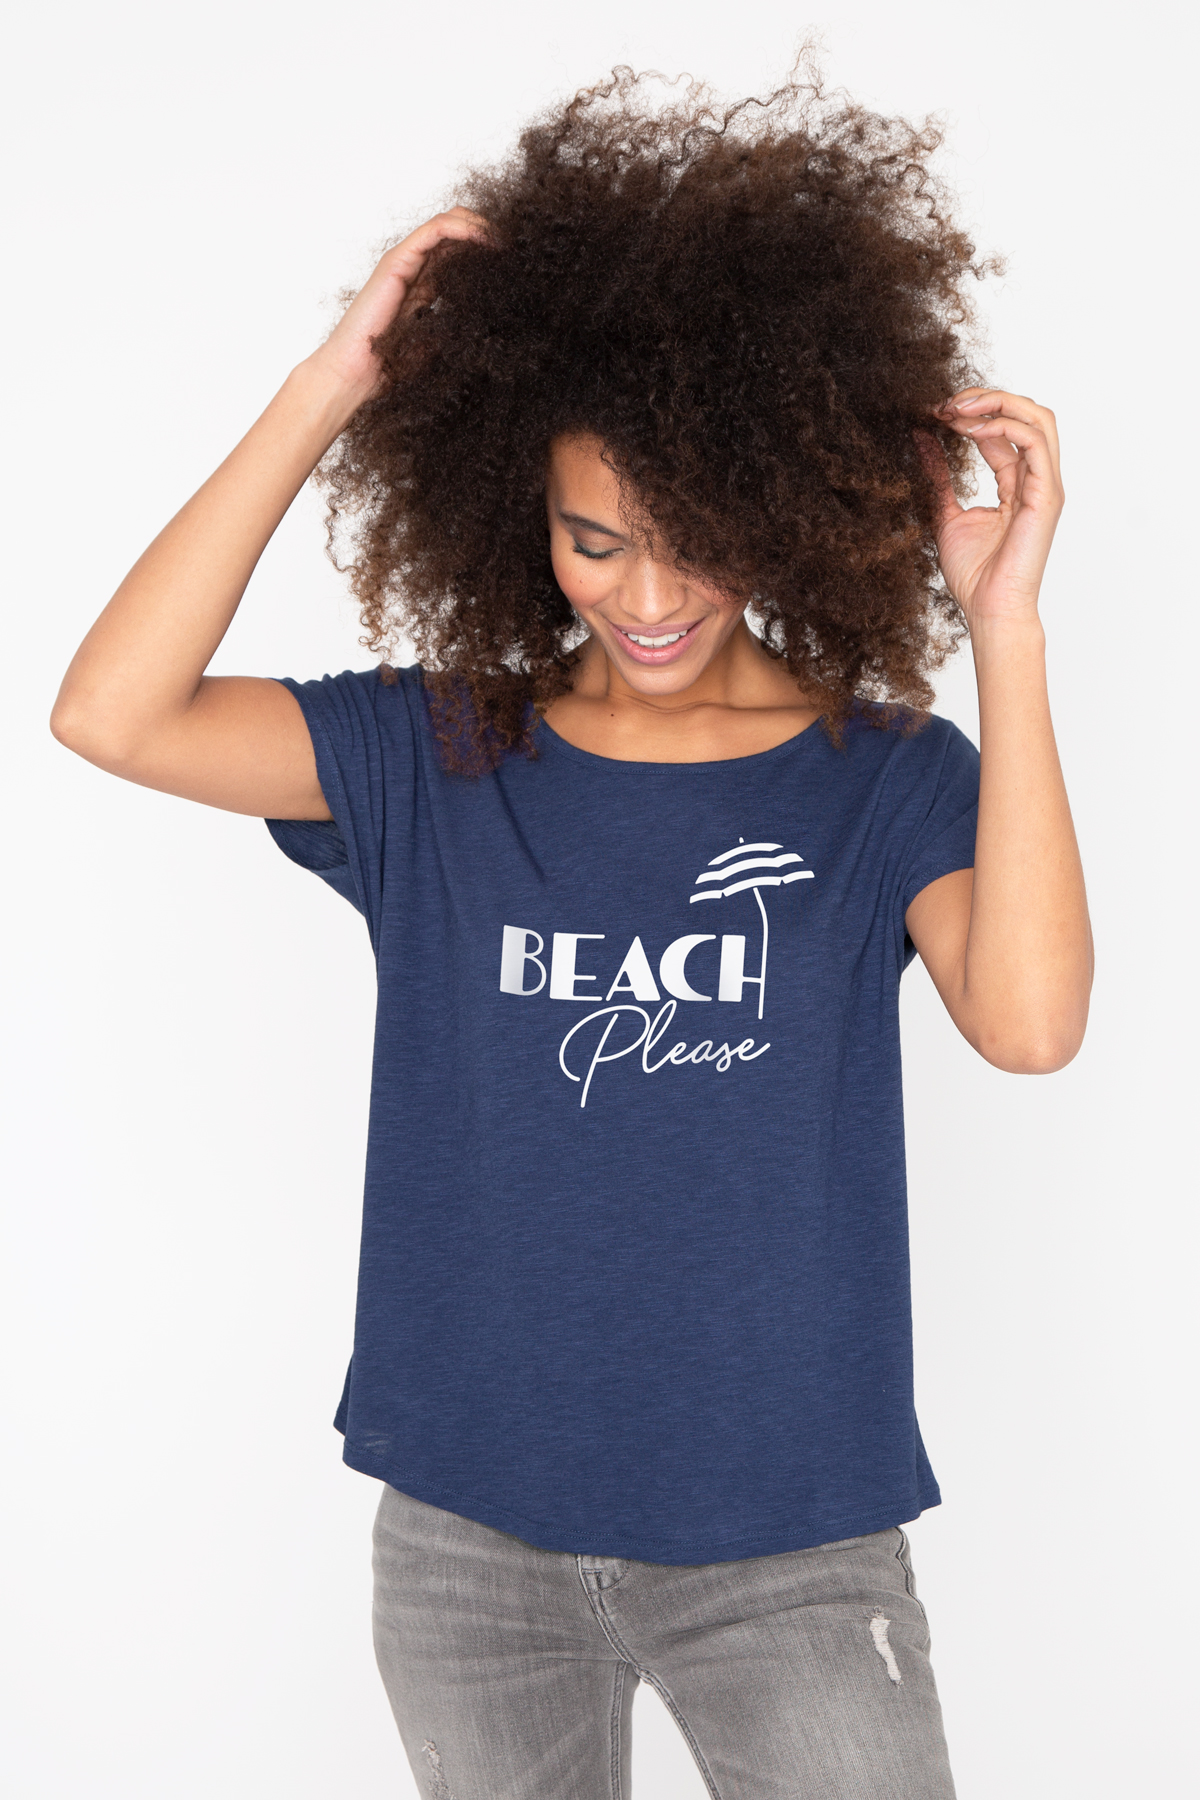 Photo de T-SHIRTS FLAMMÉS Tshirt flammé BEACH PLEASE chez French Disorder